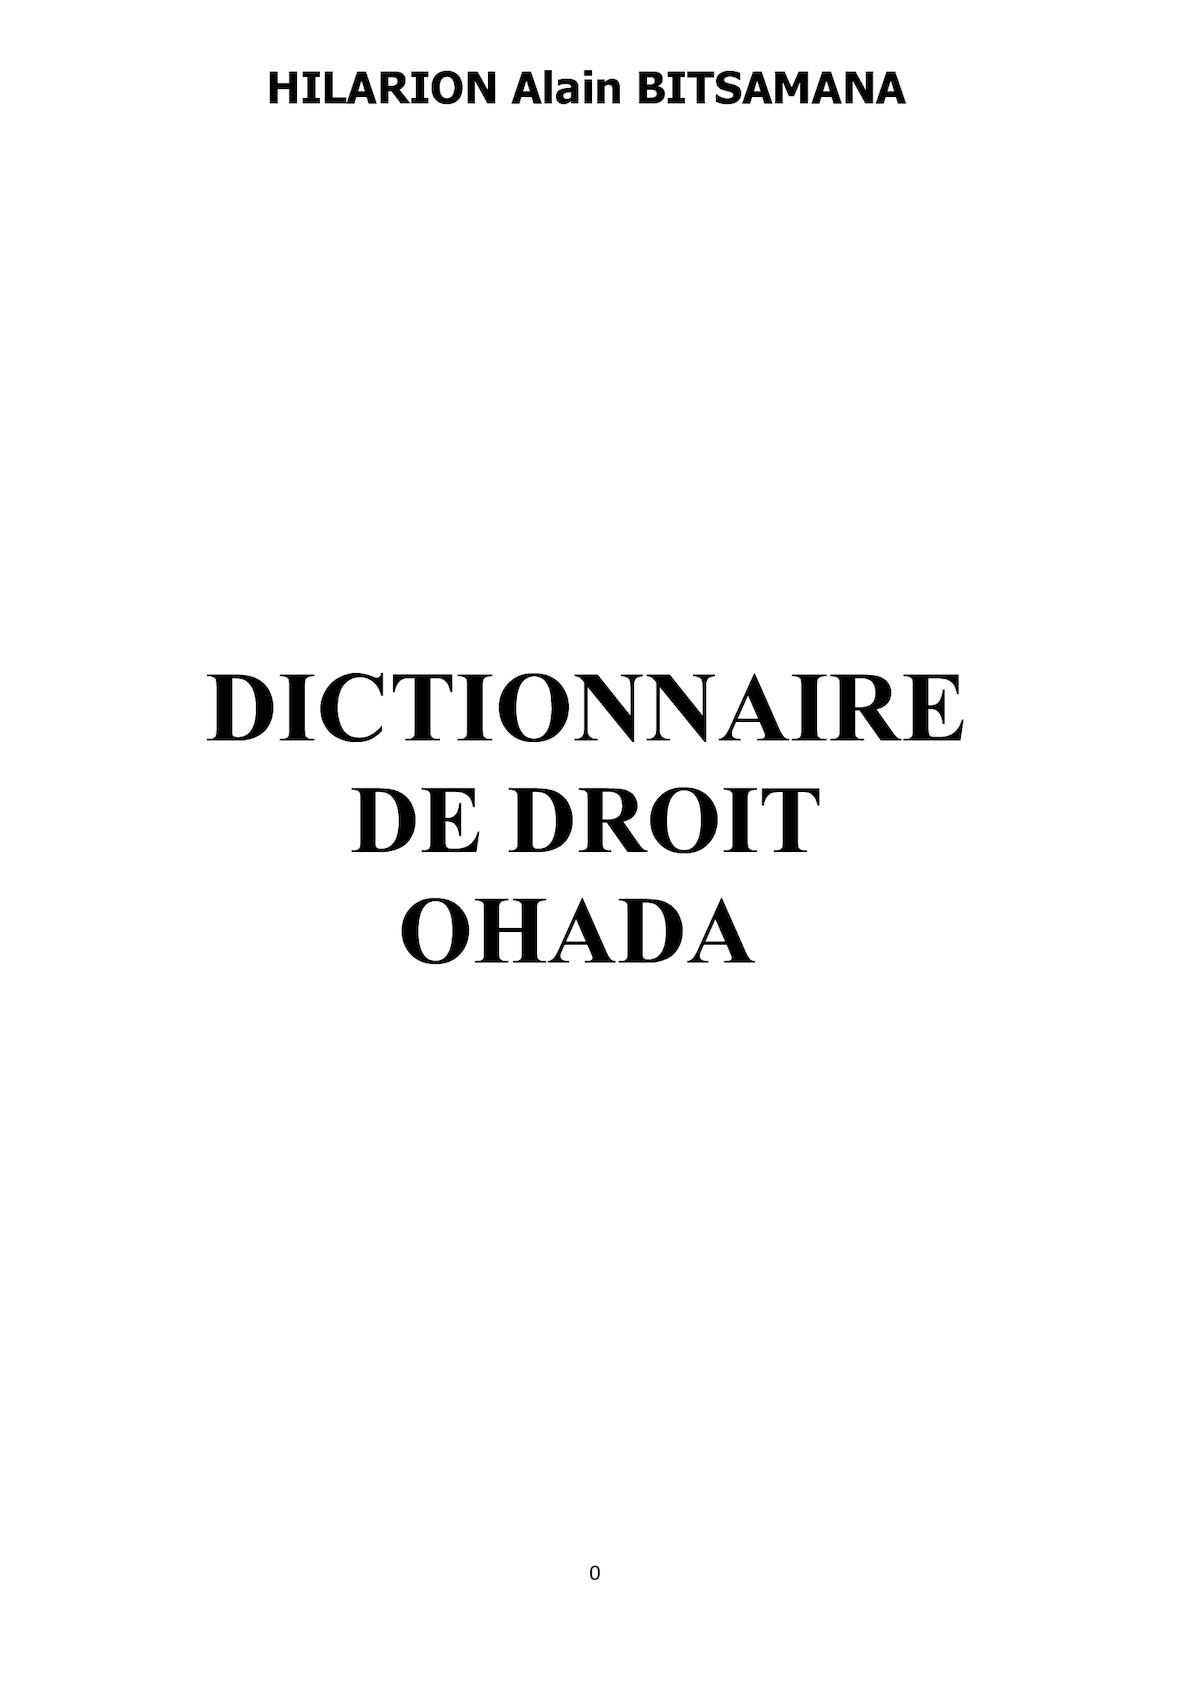 Calaméo - Dico Ohada 9d962194fcc4